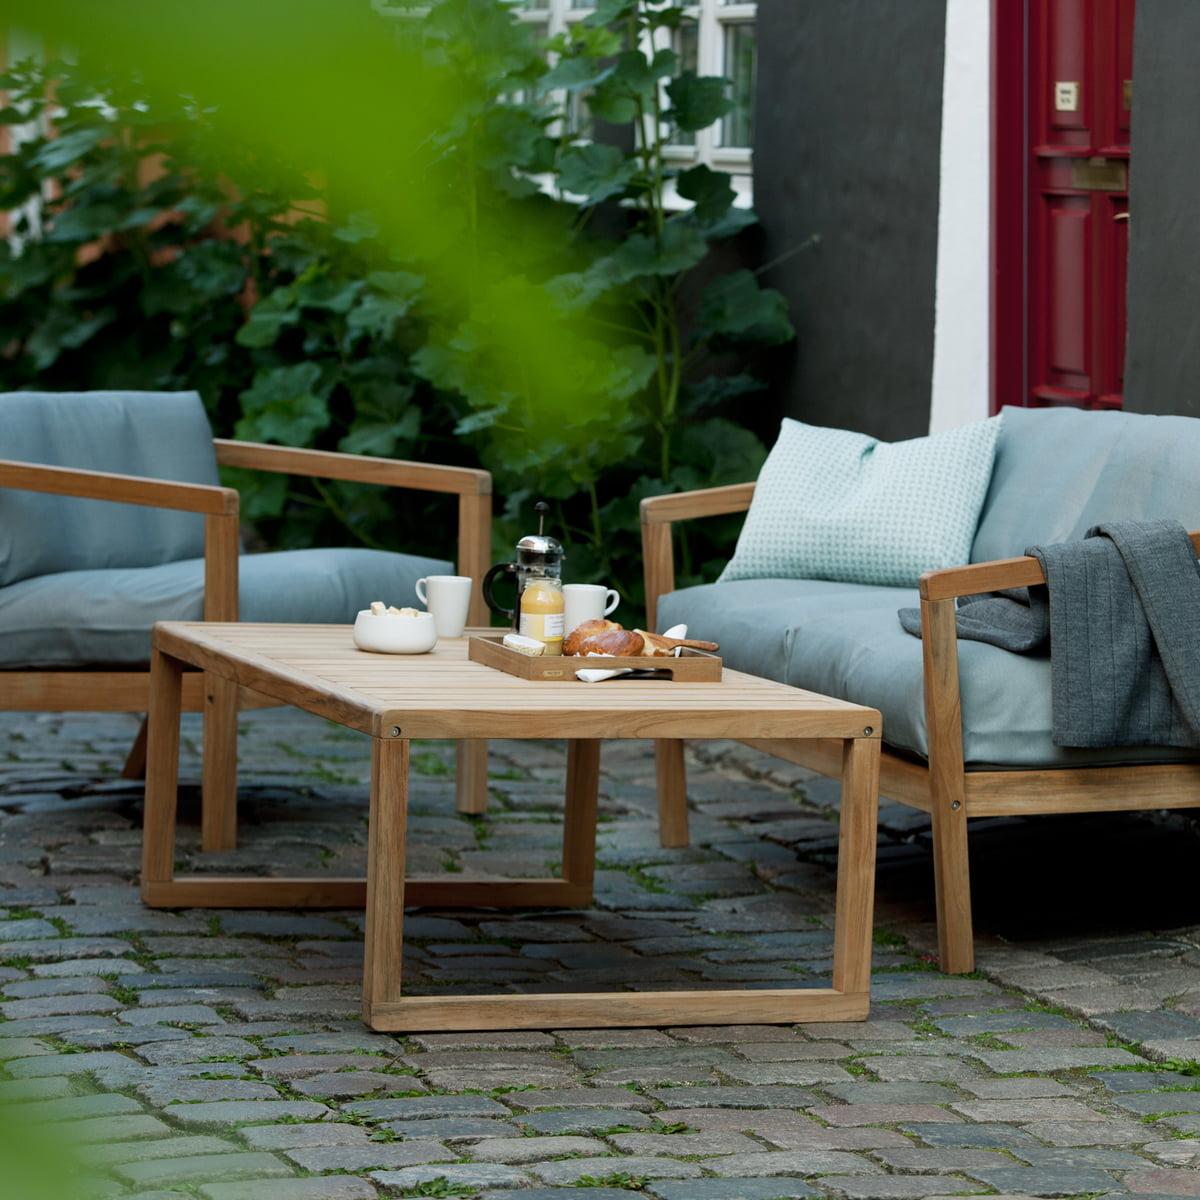 fauteuil virkelyst de skagerak sur. Black Bedroom Furniture Sets. Home Design Ideas